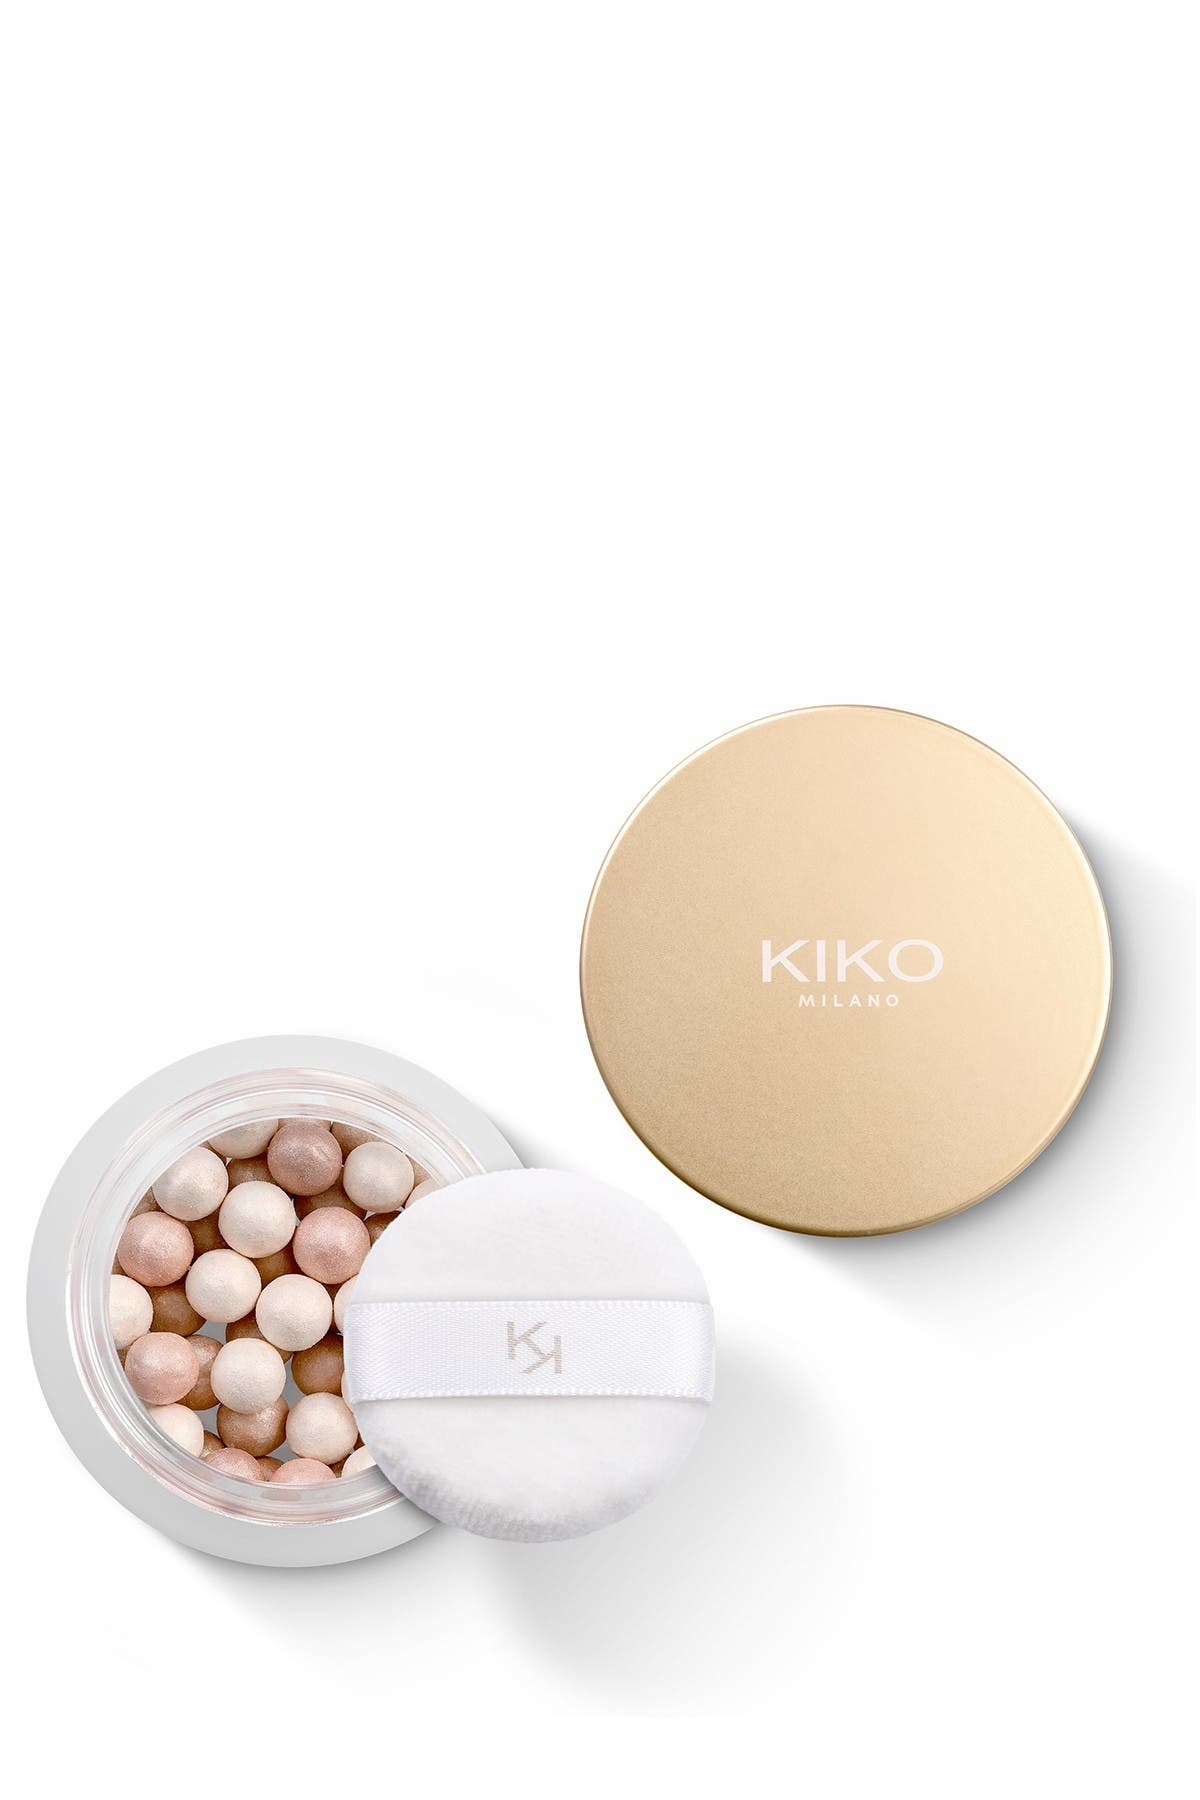 Image of Kiko Milano Mood Boost Pearls Of Light Highlighter - 02 Golden Soul